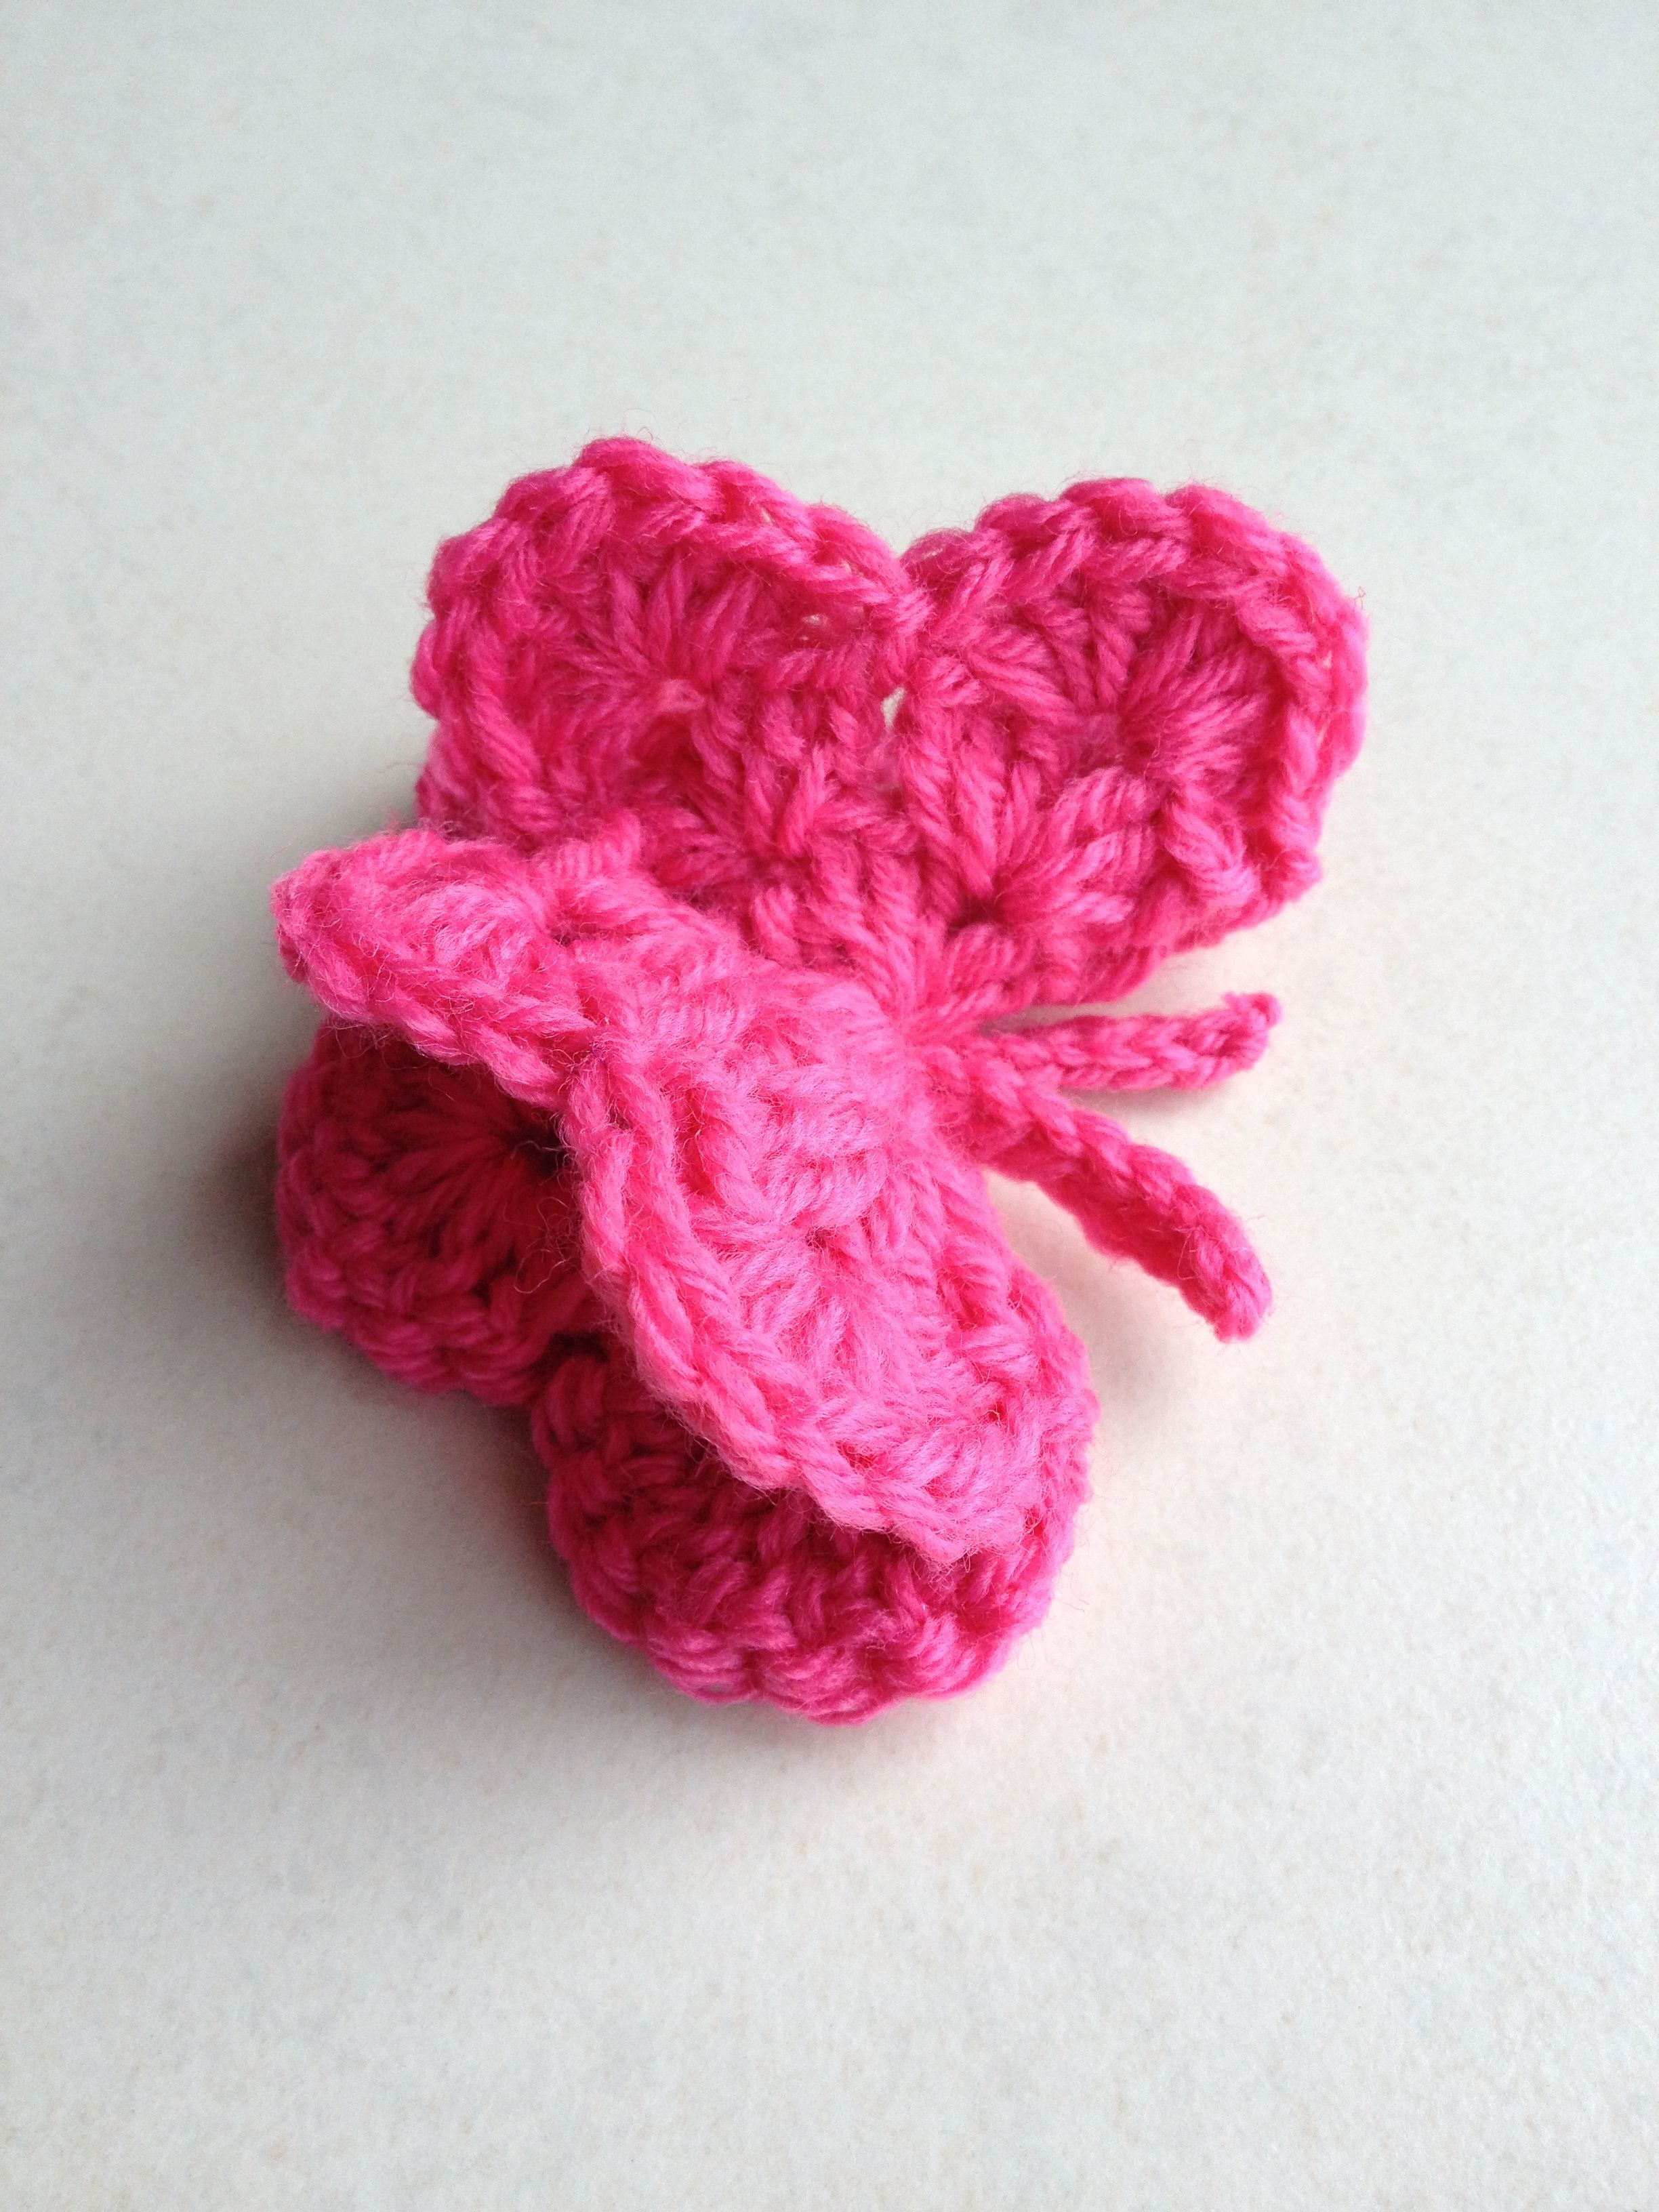 Crochet Butterfly : Crochet Butterfly Crafty Inspiration DIY & Crochet Pinterest